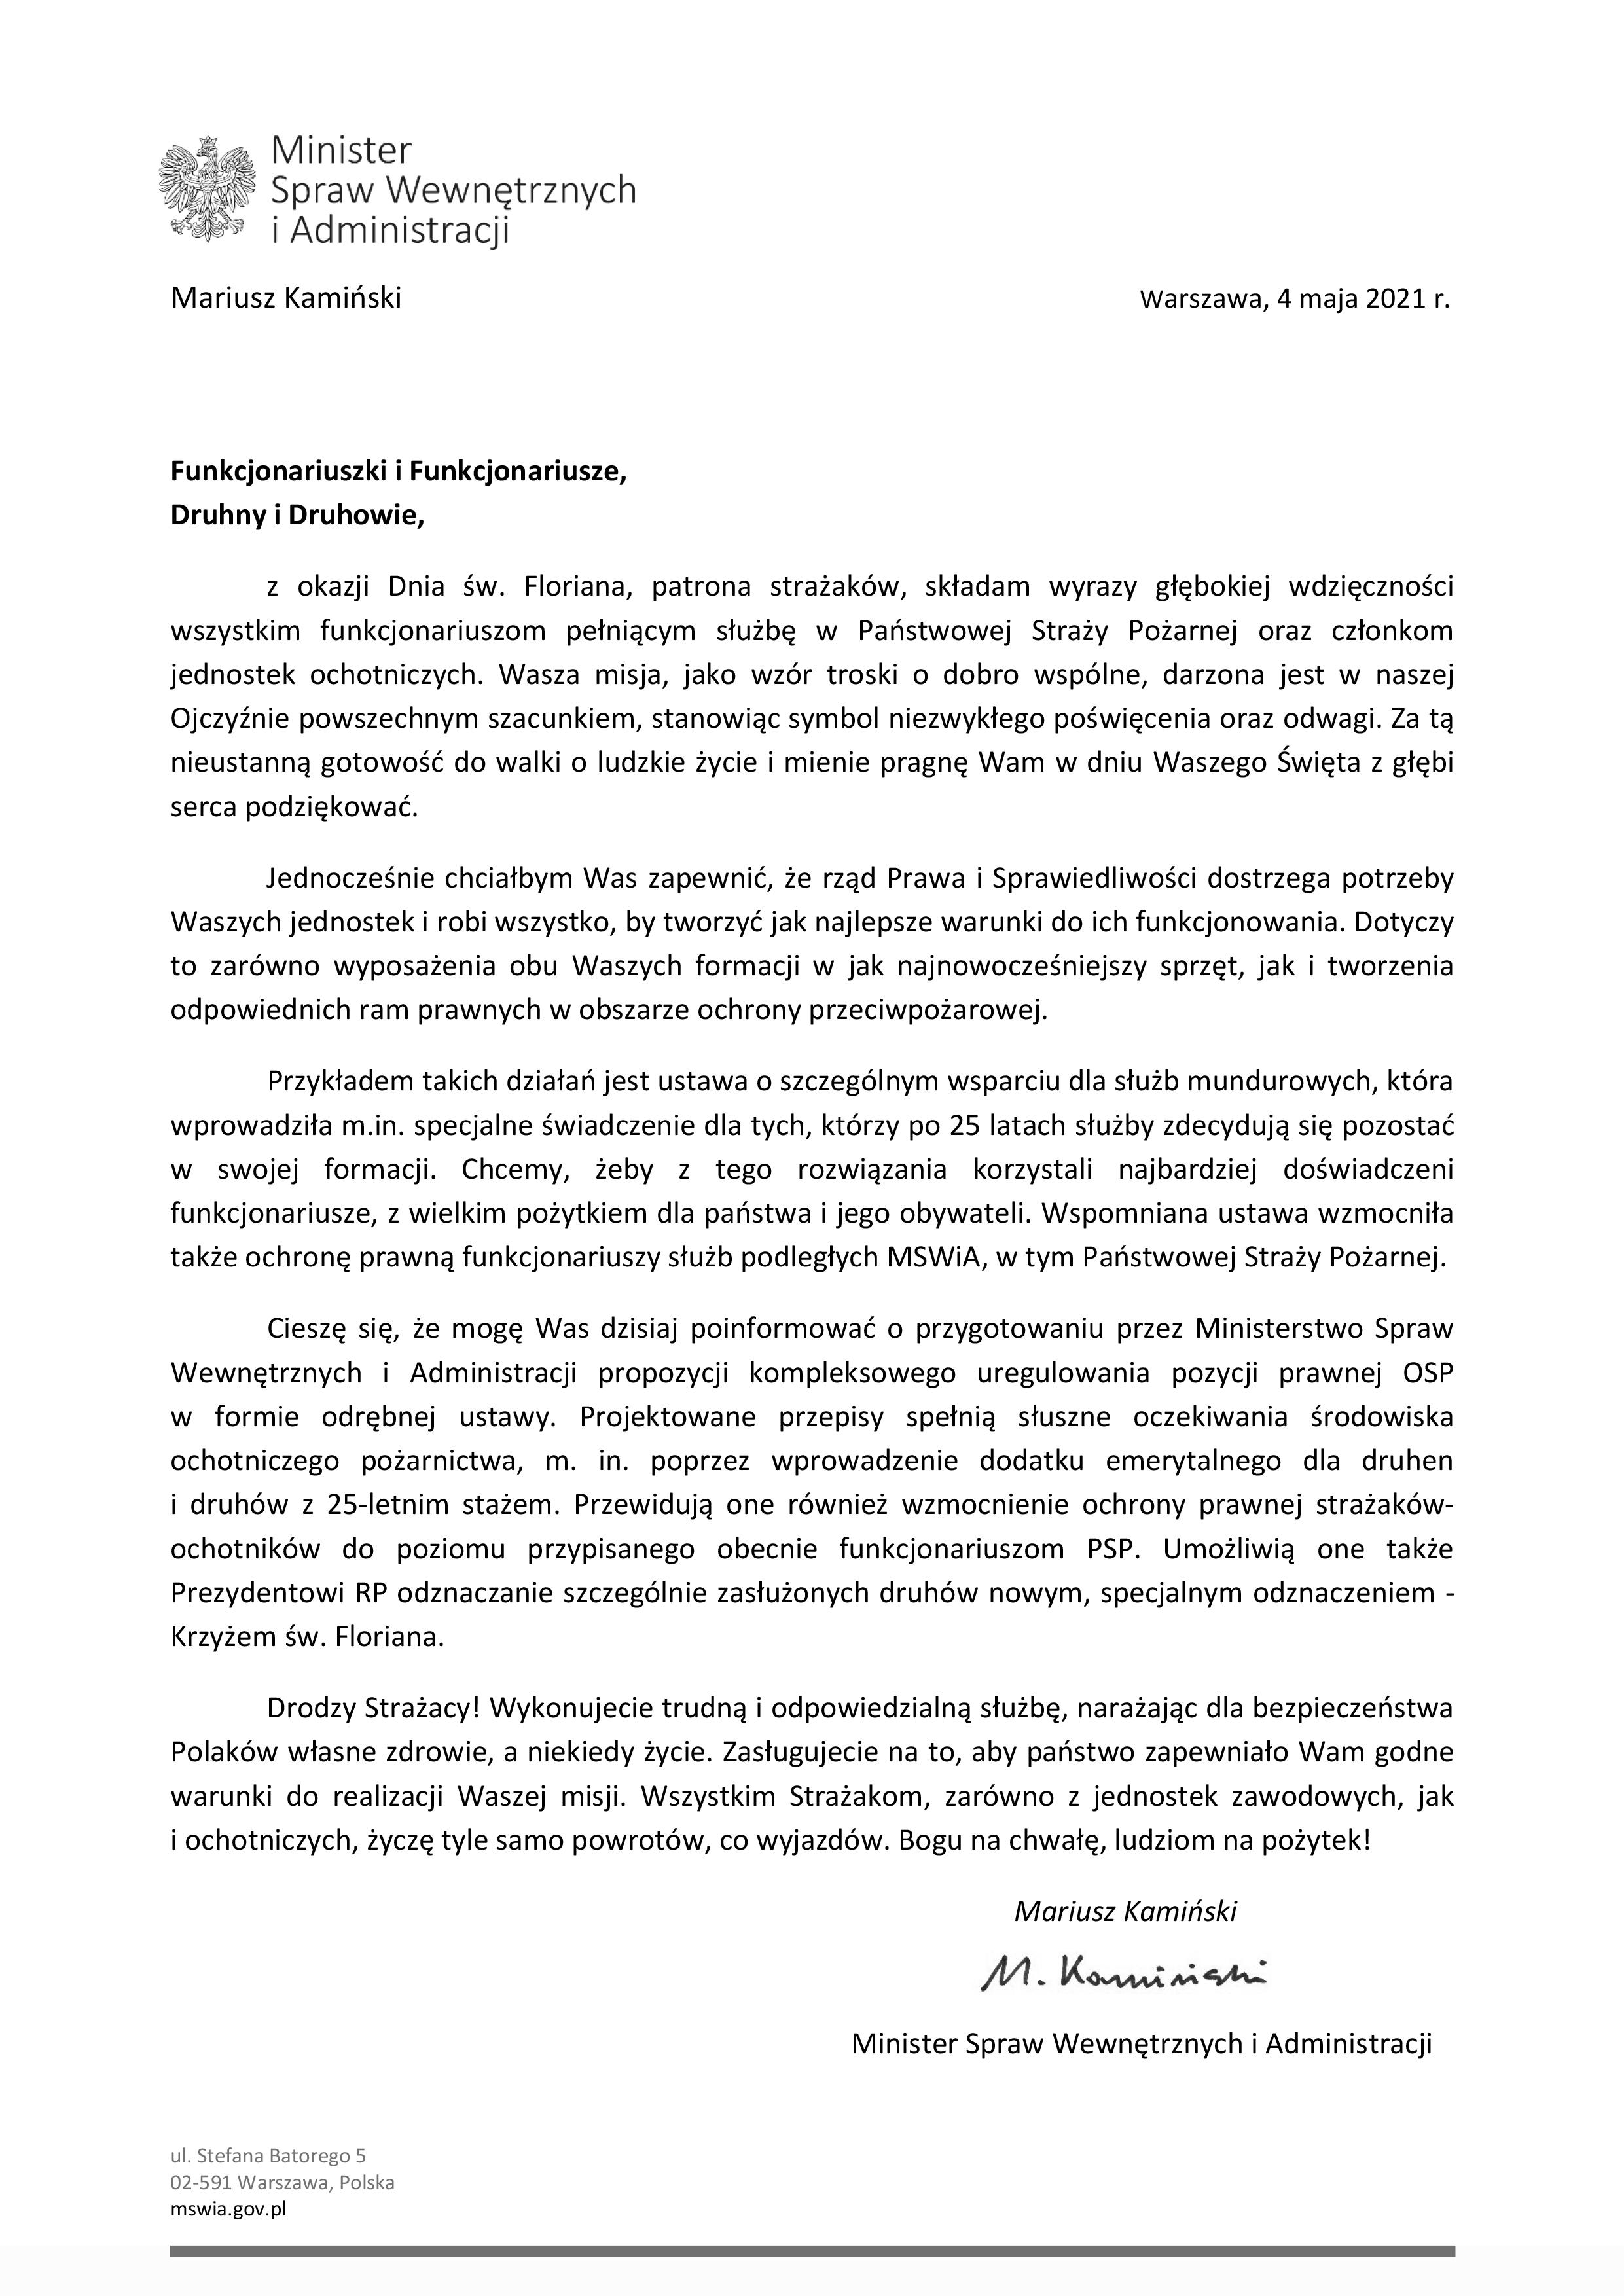 List ministra SWiA